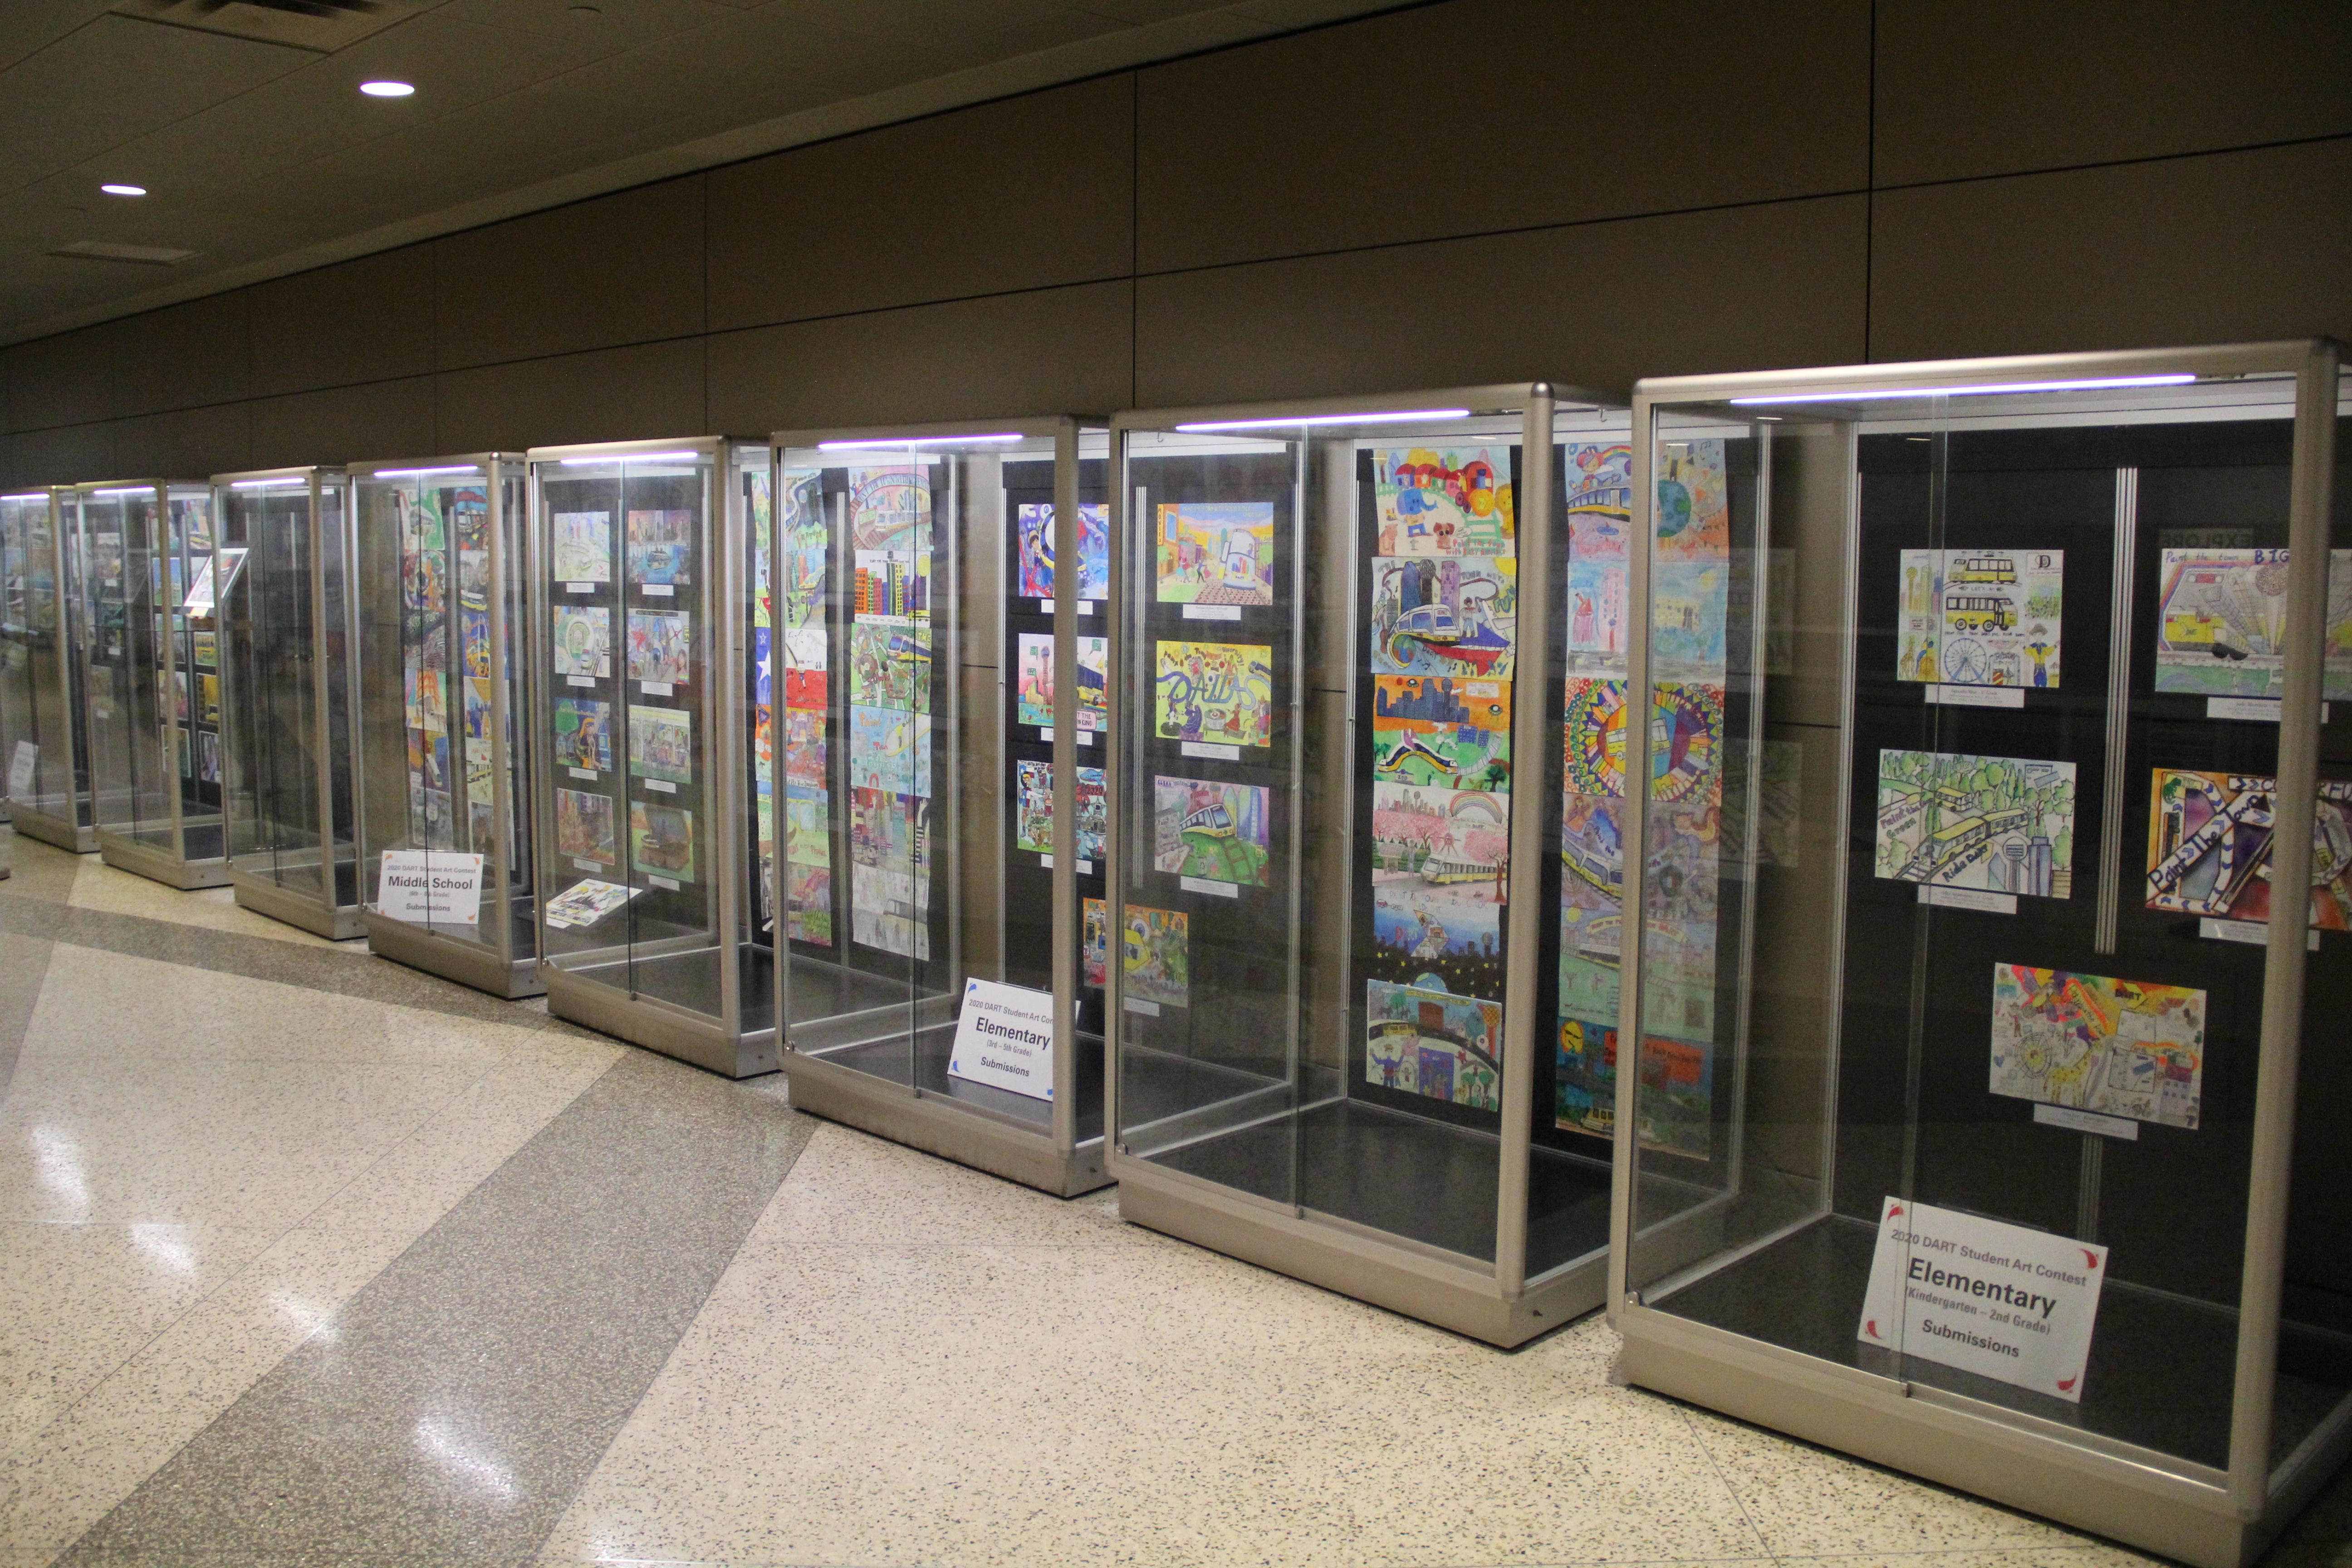 Dallas Love Field Displays 2020 DART Student Art Contest Pieces Through August